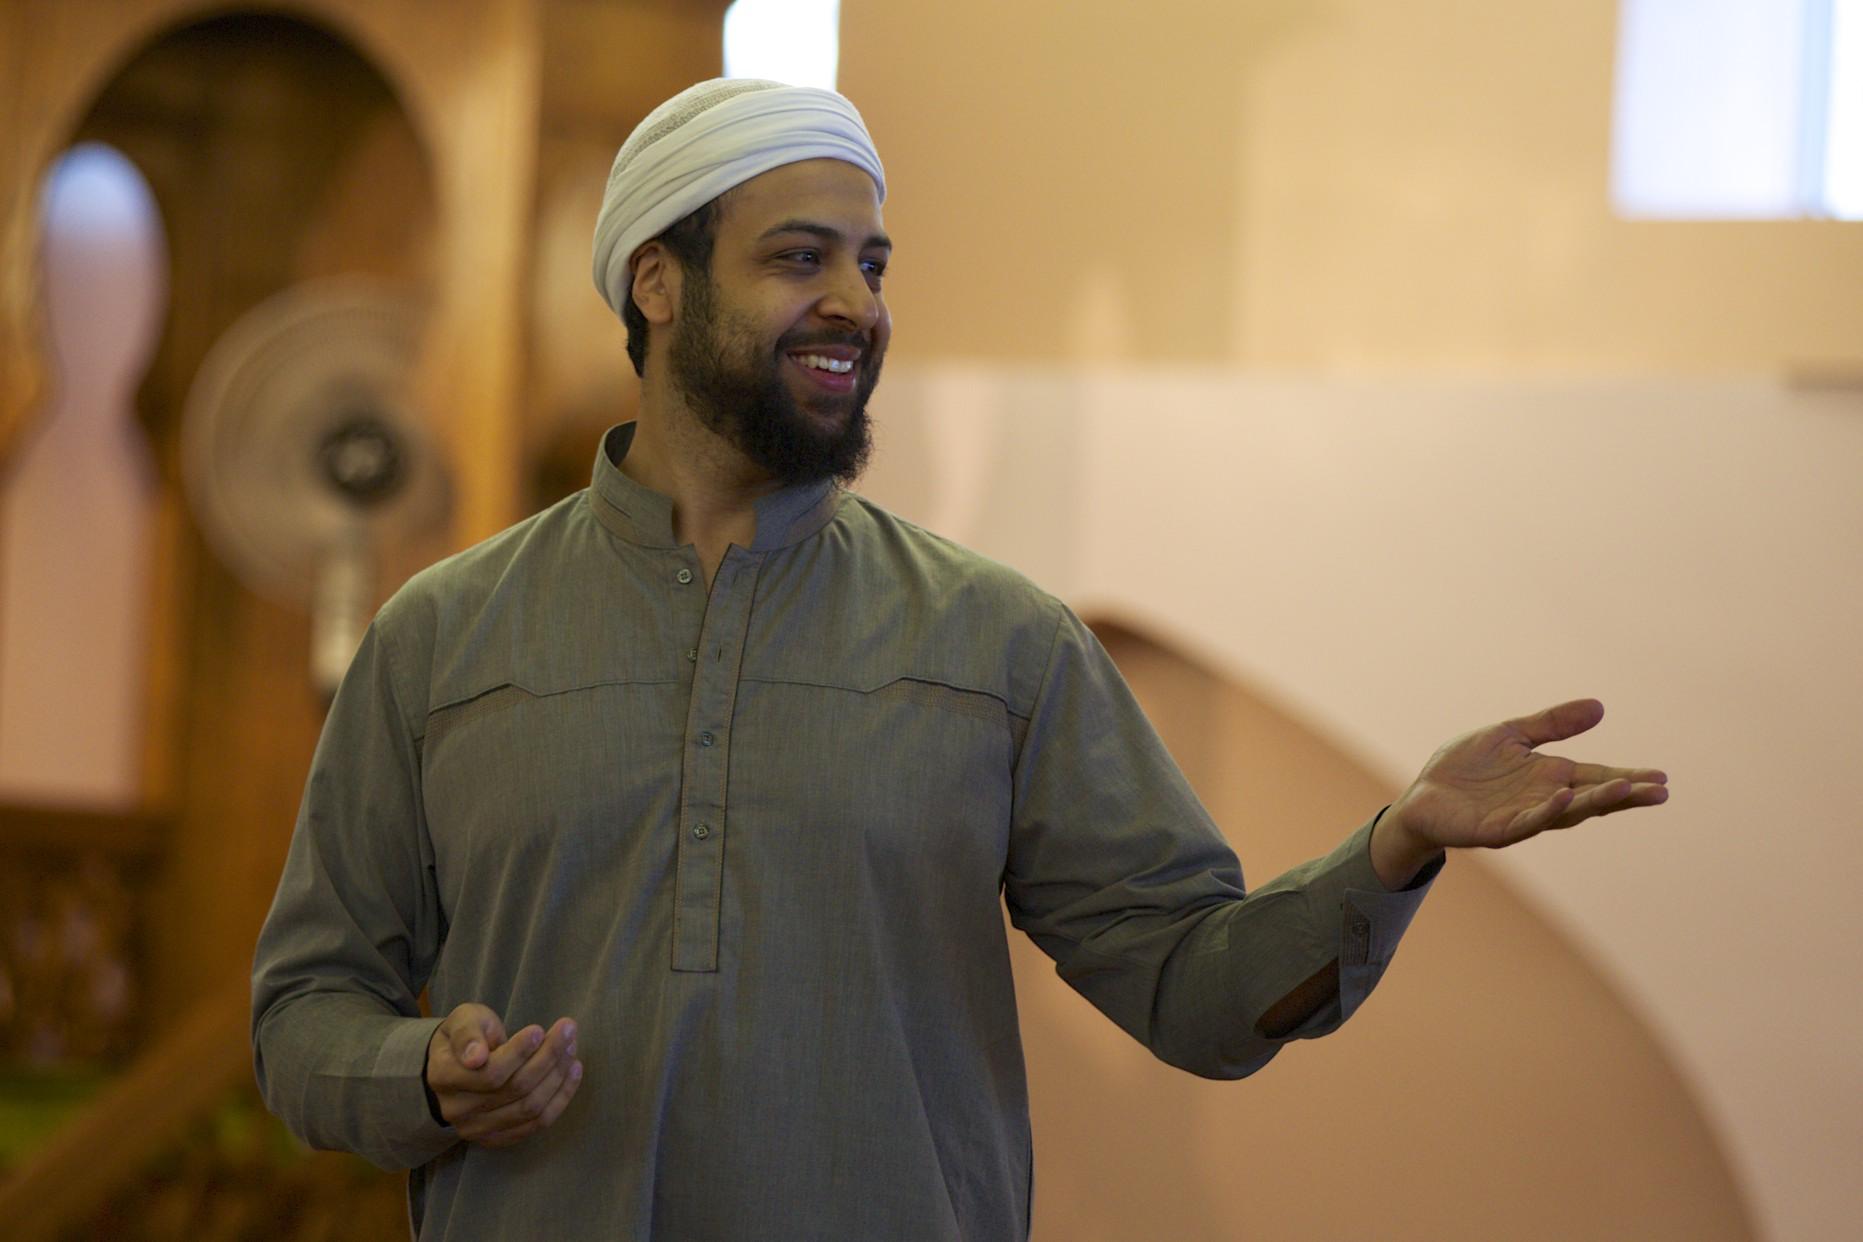 Muslim host